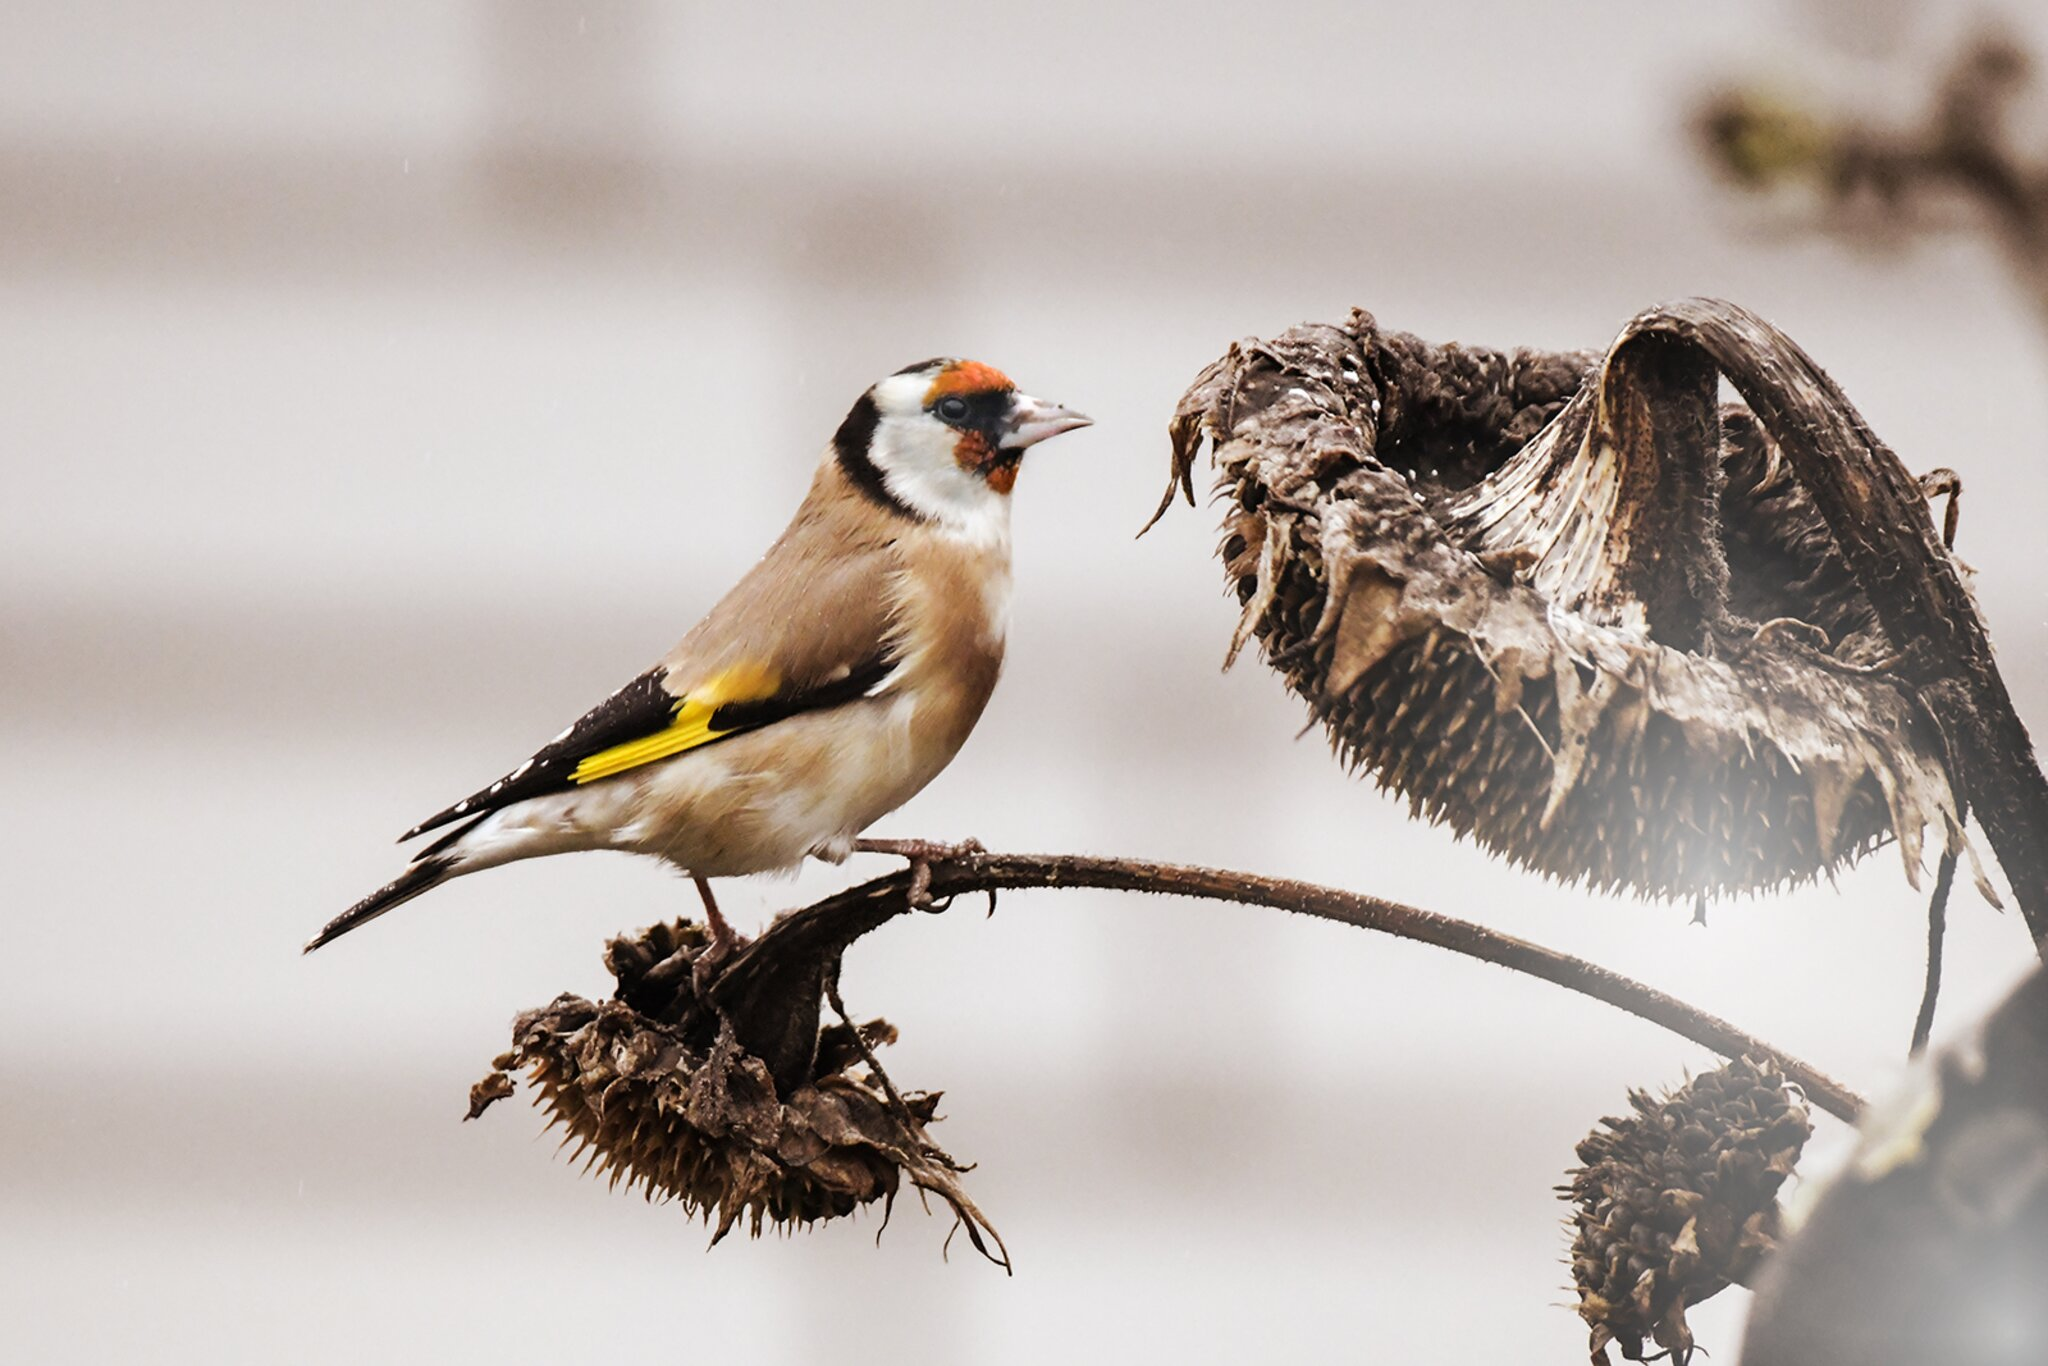 Trumpf: ... und fördert die Artenvielfalt - Sonsbeck...